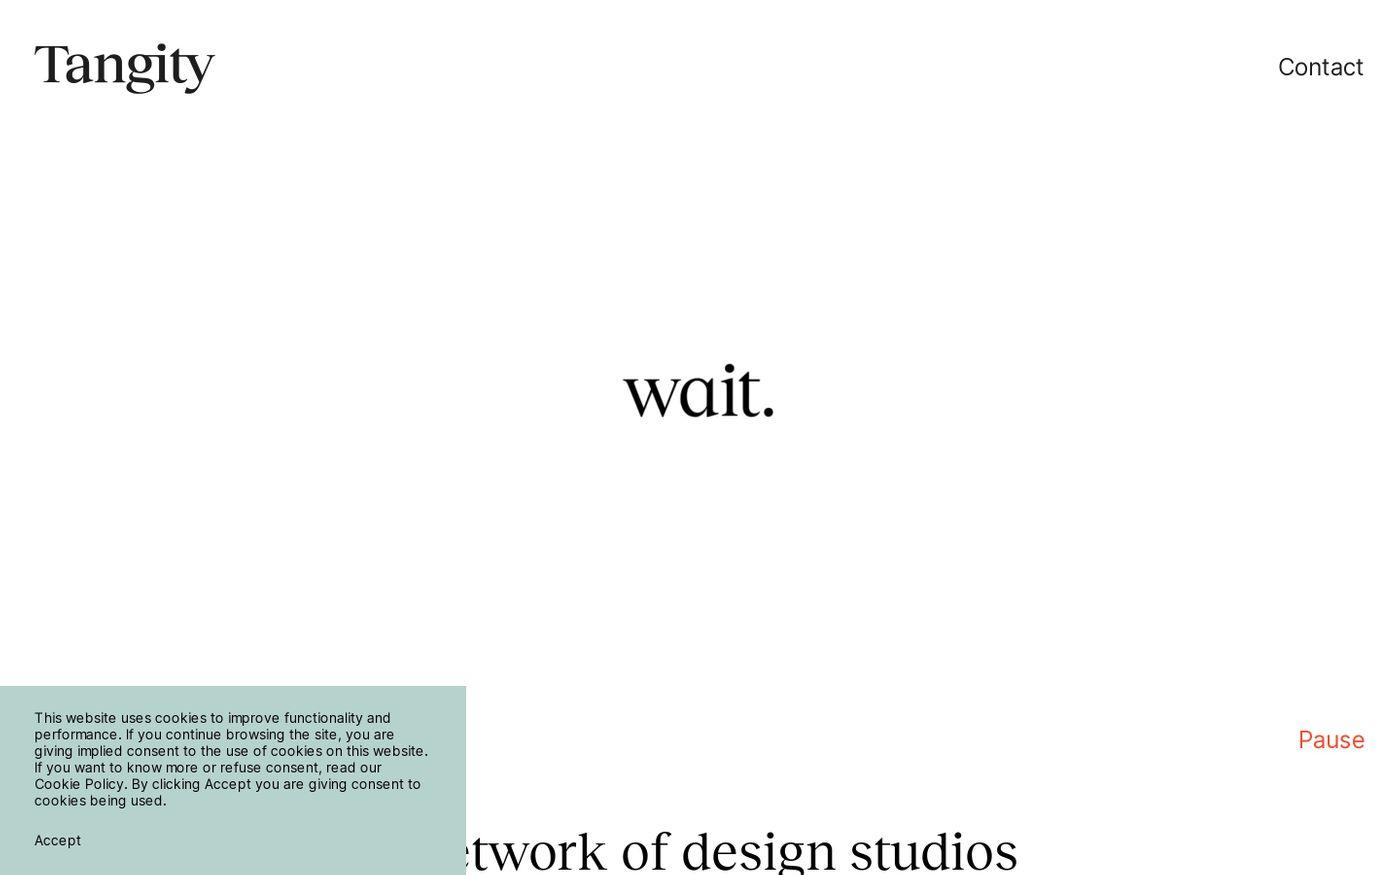 Screenshot of Tangity website